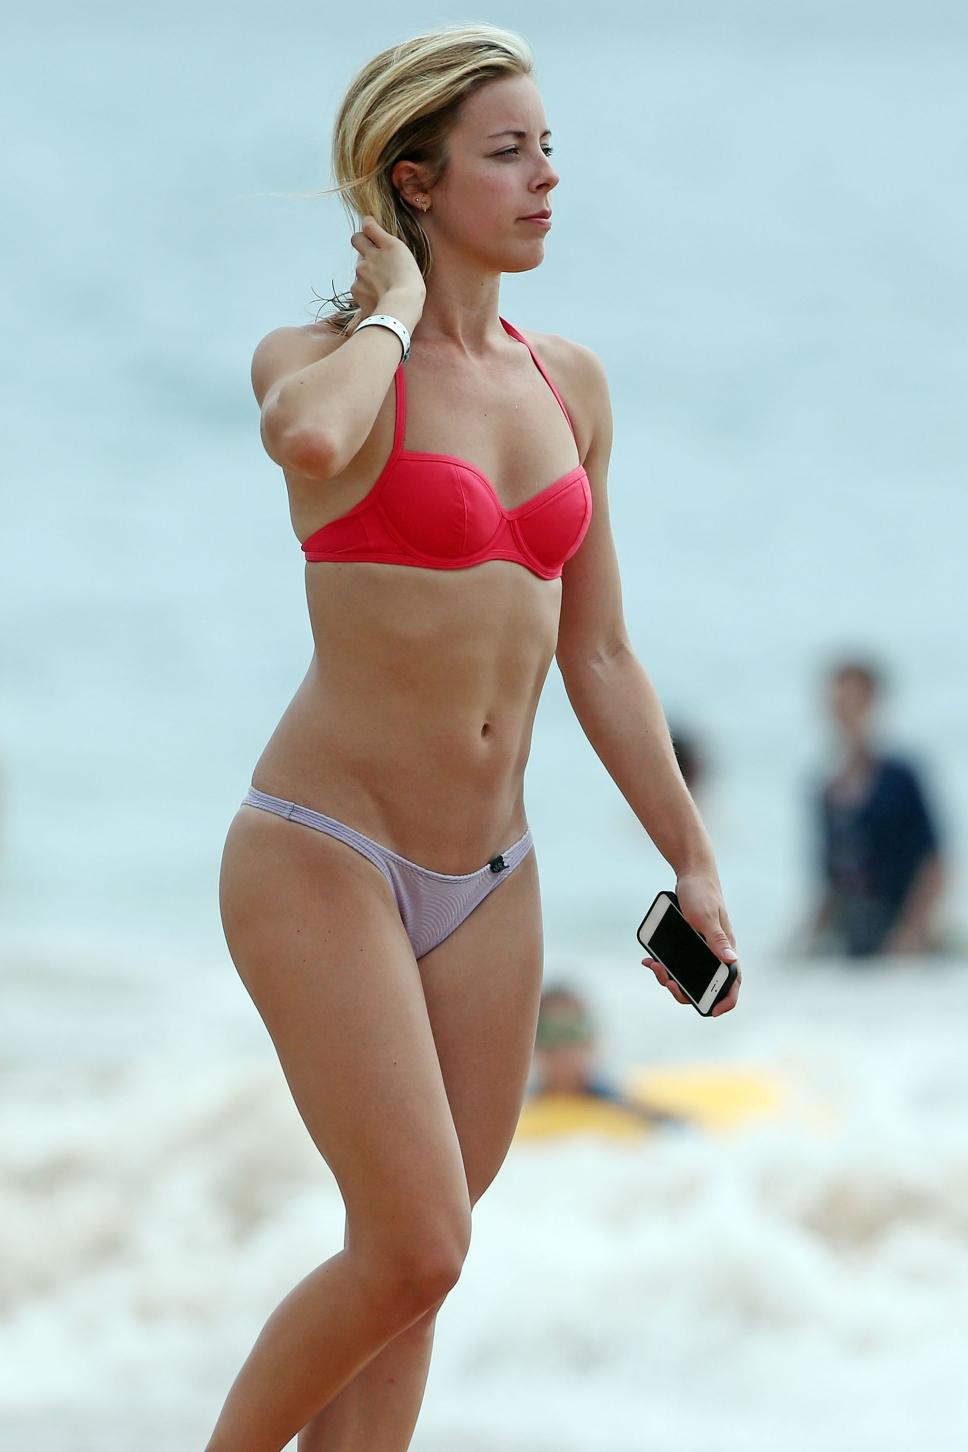 Ashley Wagner in a bikini